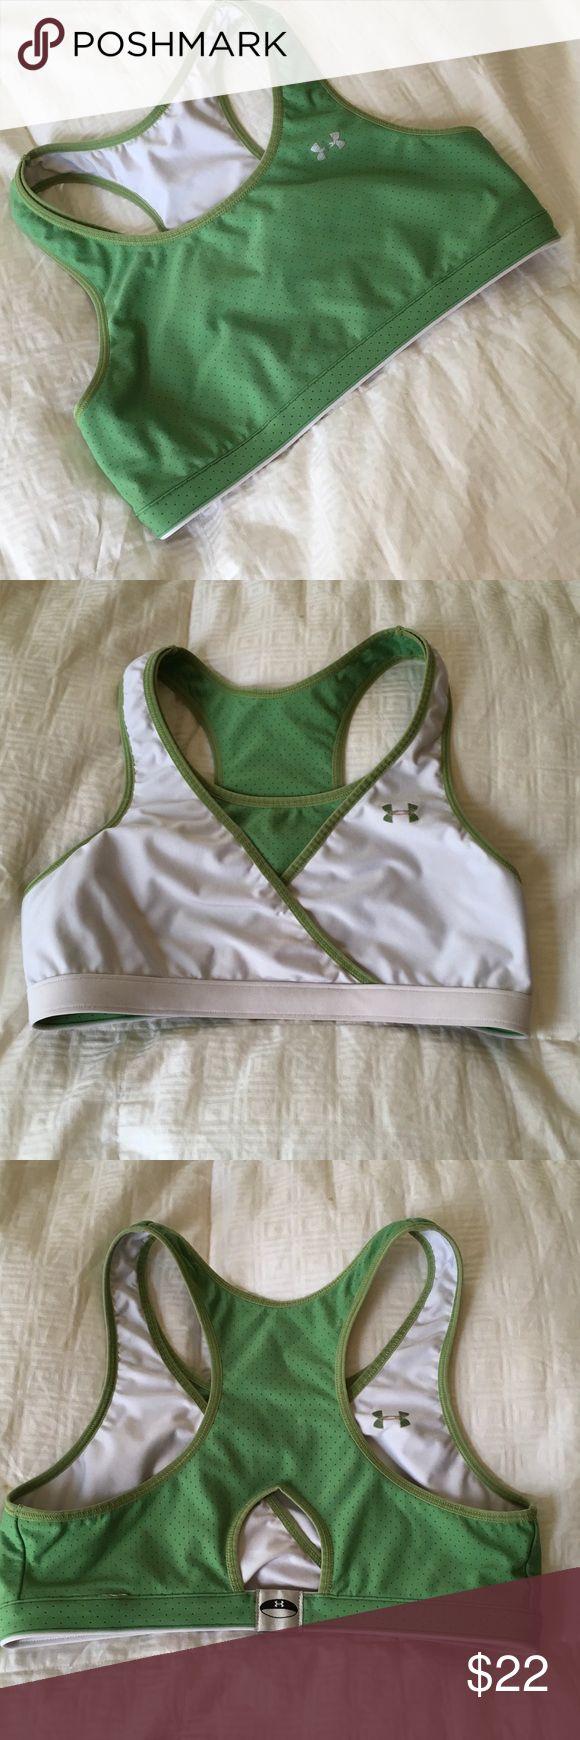 Under armor jog bra size medium . Worn only a handful of times Under Armour Intimates & Sleepwear Bras